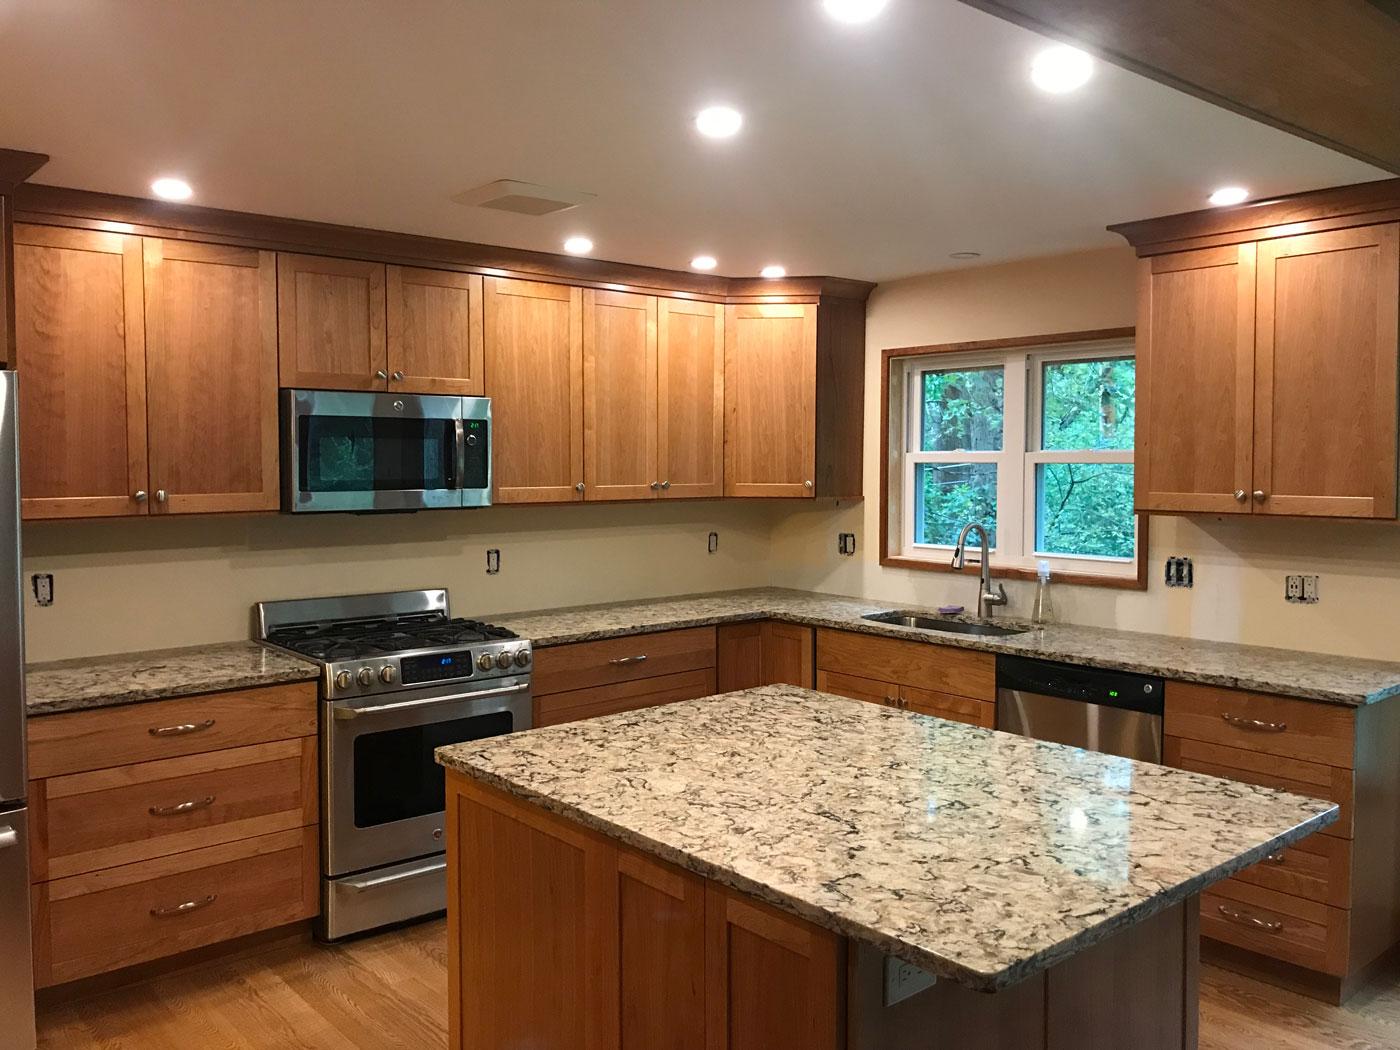 Custom Kitchen Design - Craftworks Custom Cabinetry - Rochester, NY